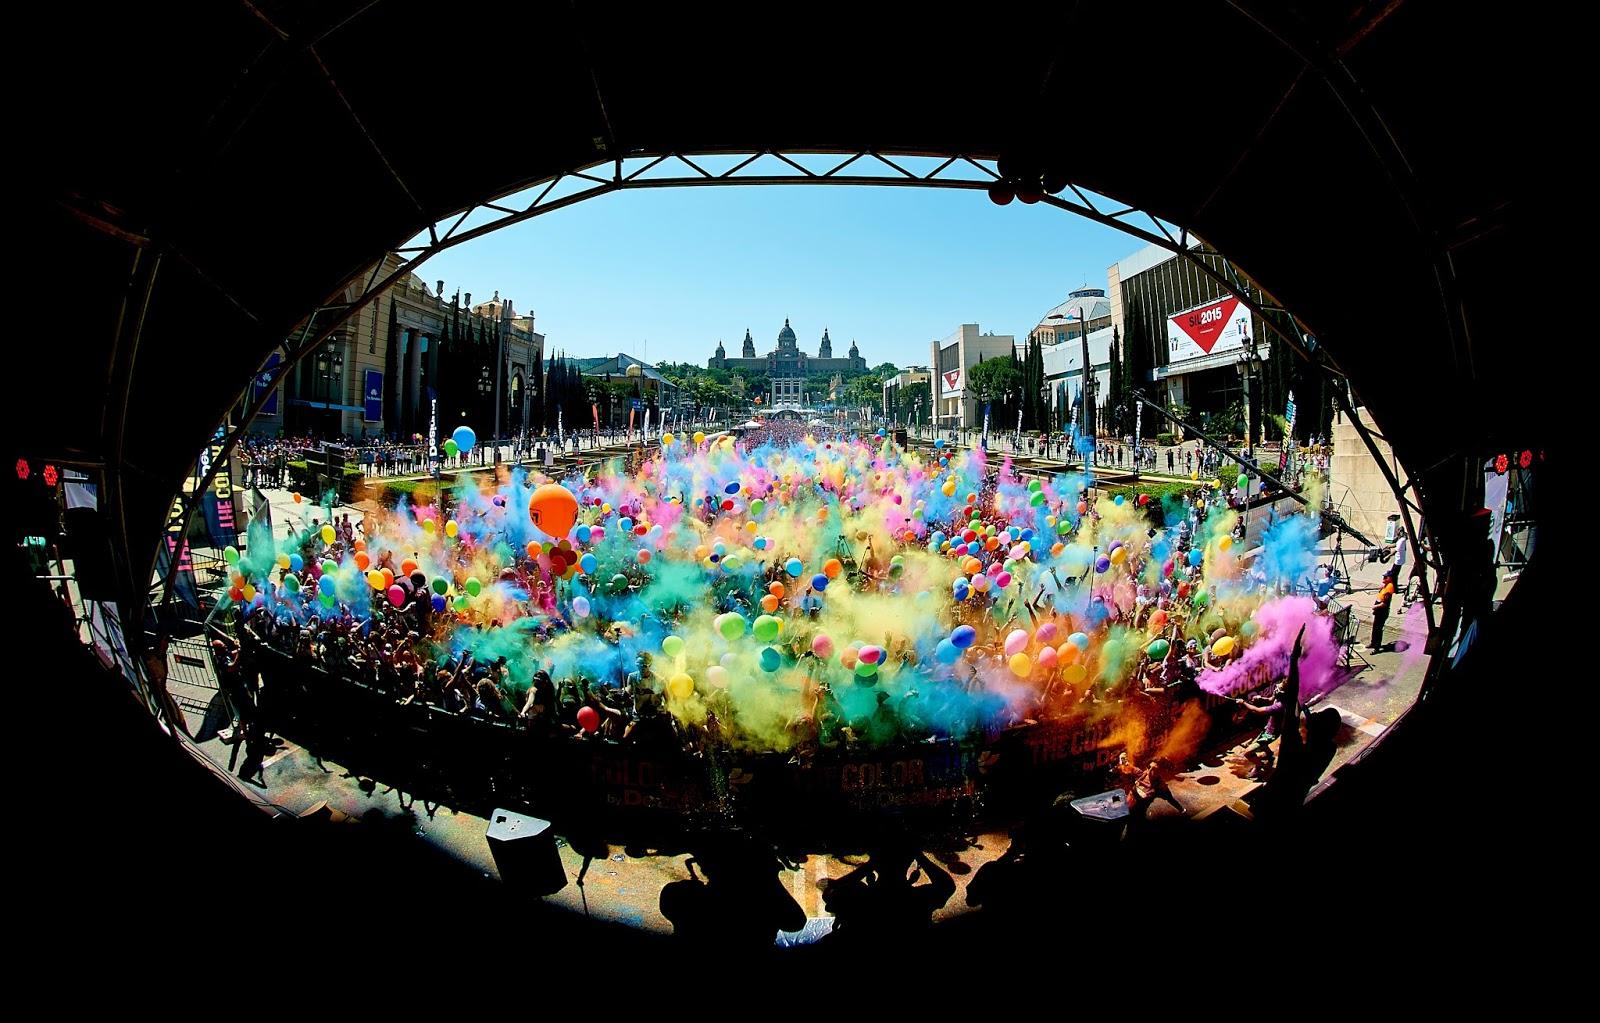 The Color Run by skittles llega a Barcelona el 2 de Octubre